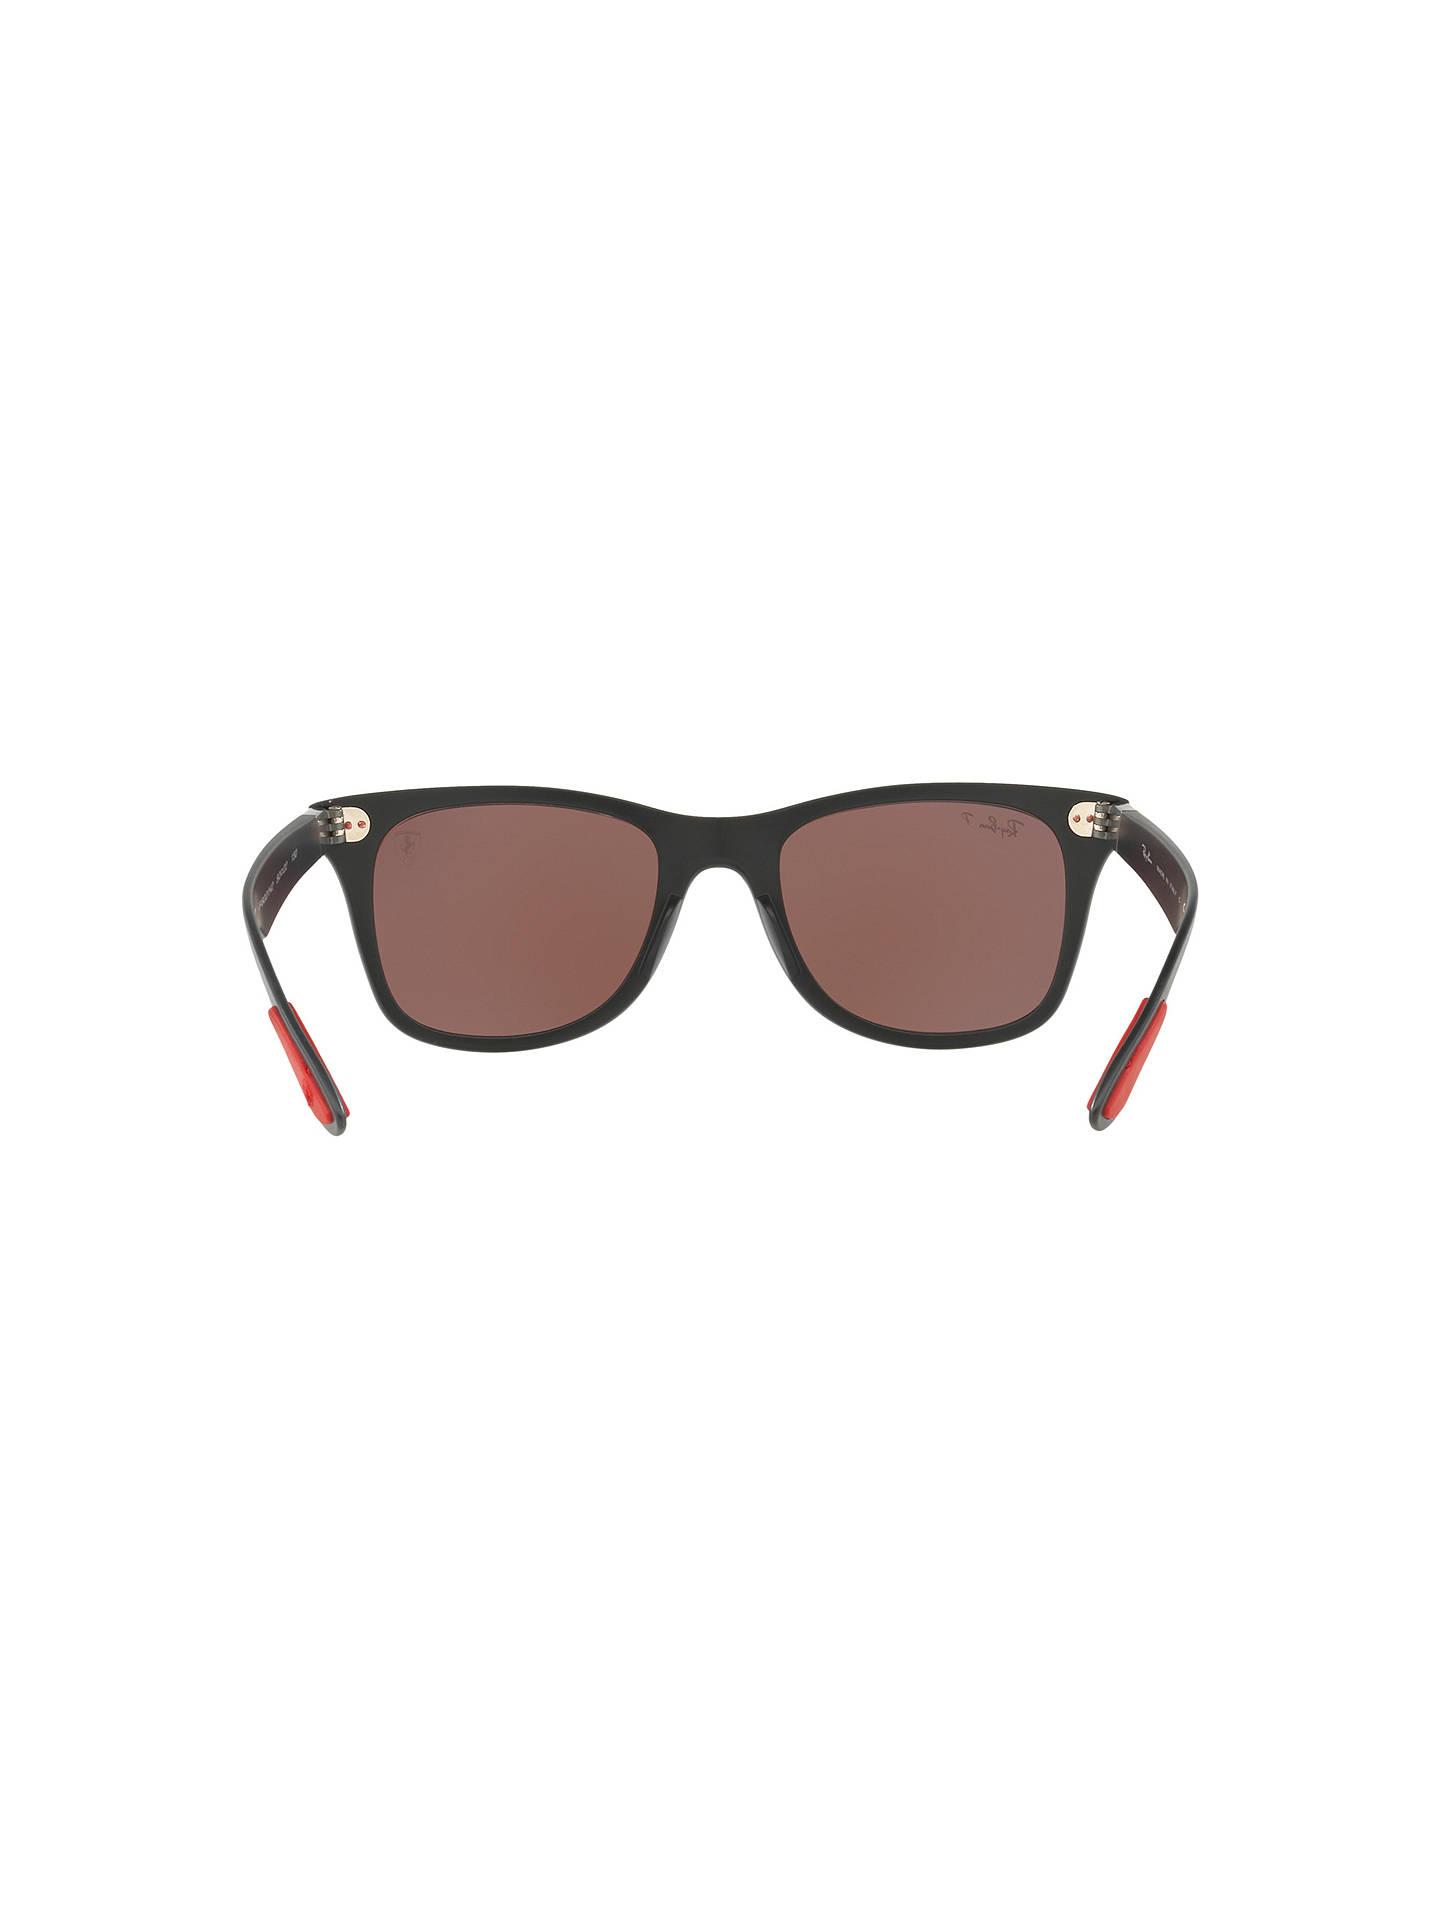 7d8ac1f4e9 ... Buy Ray-Ban RB4195M Polarised Scuderia Ferrari Wayfarer Sunglasses